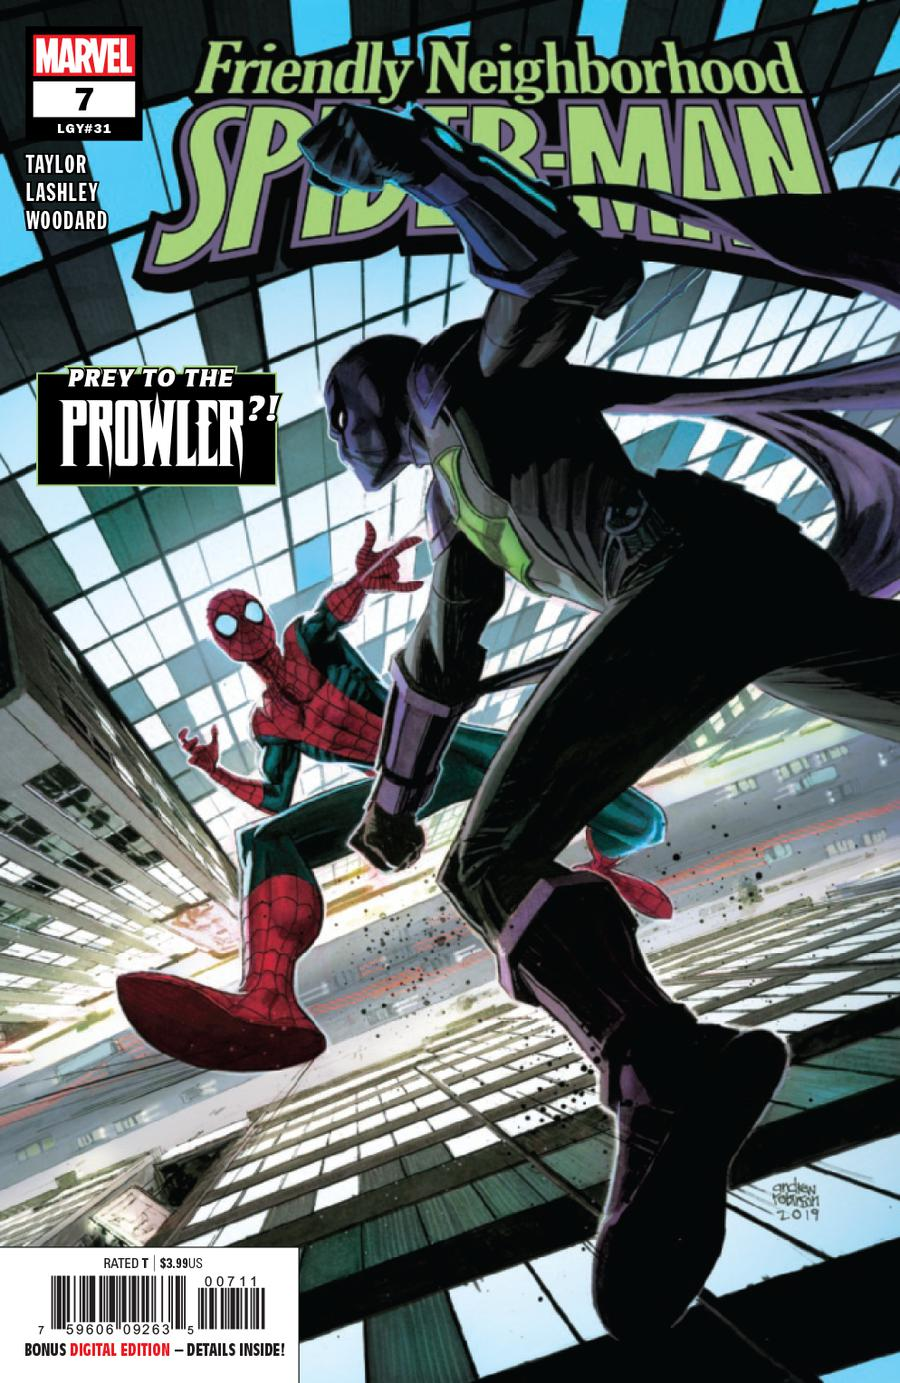 Friendly Neighborhood Spider-Man Vol 2 #7